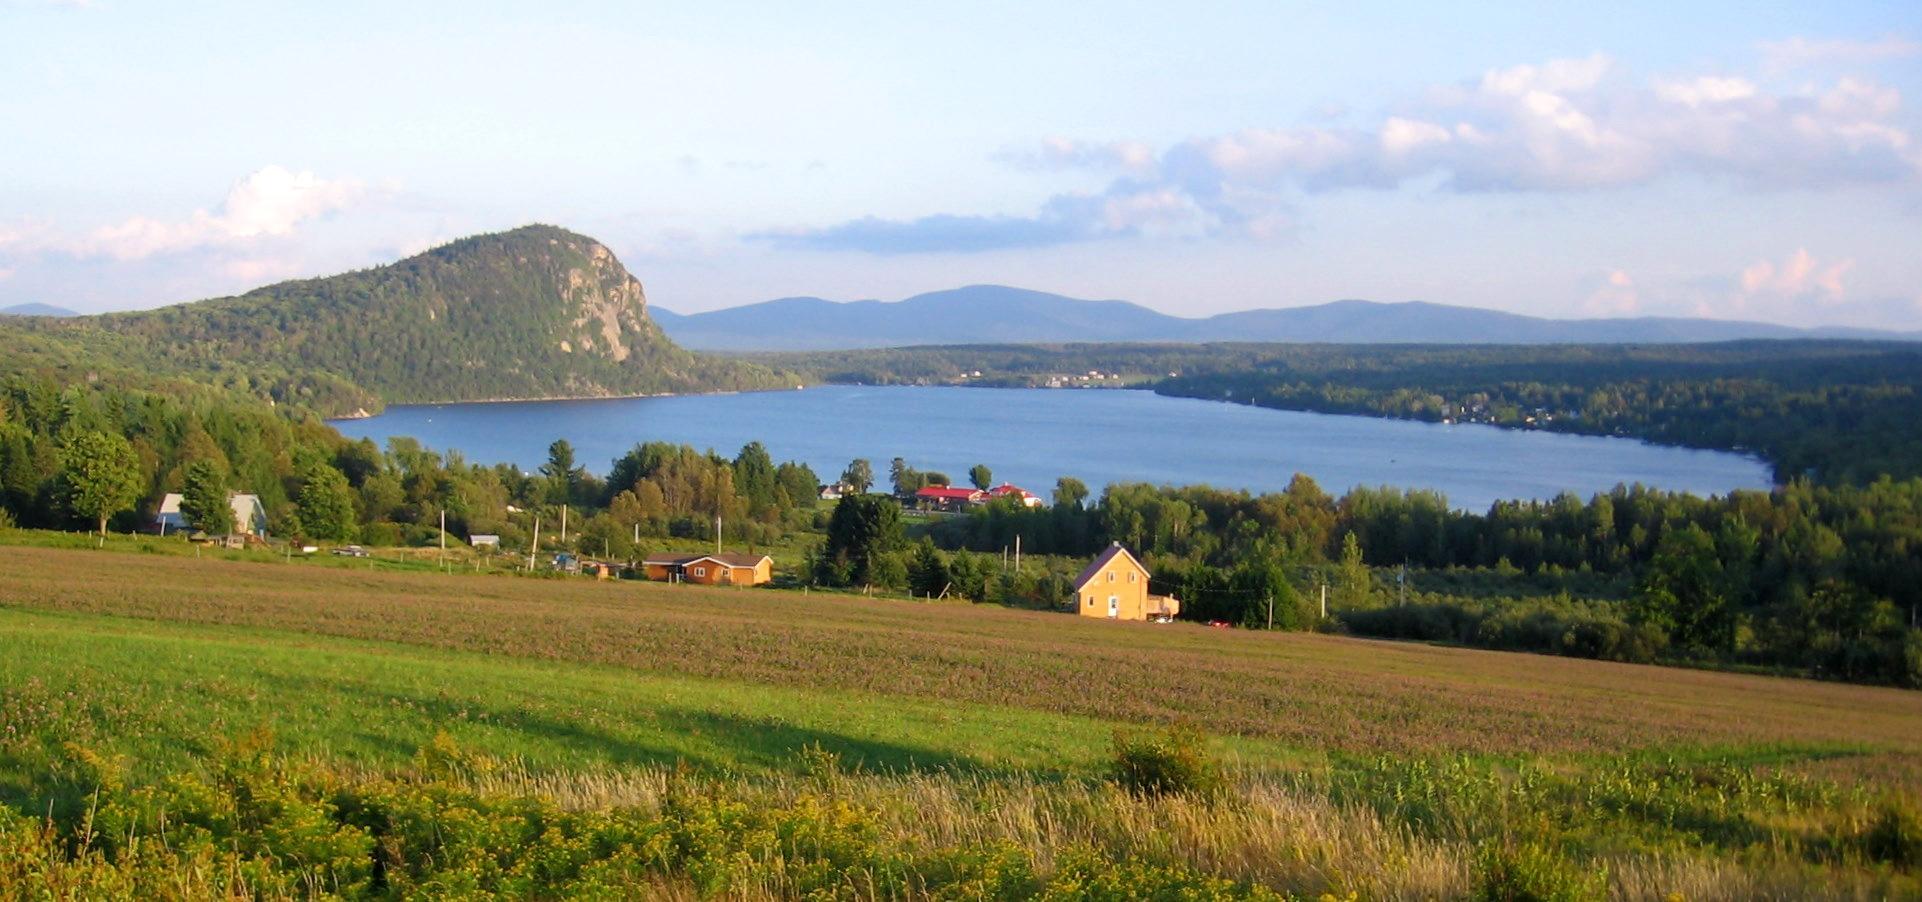 bassin-versant-paysage-topographie-rappel